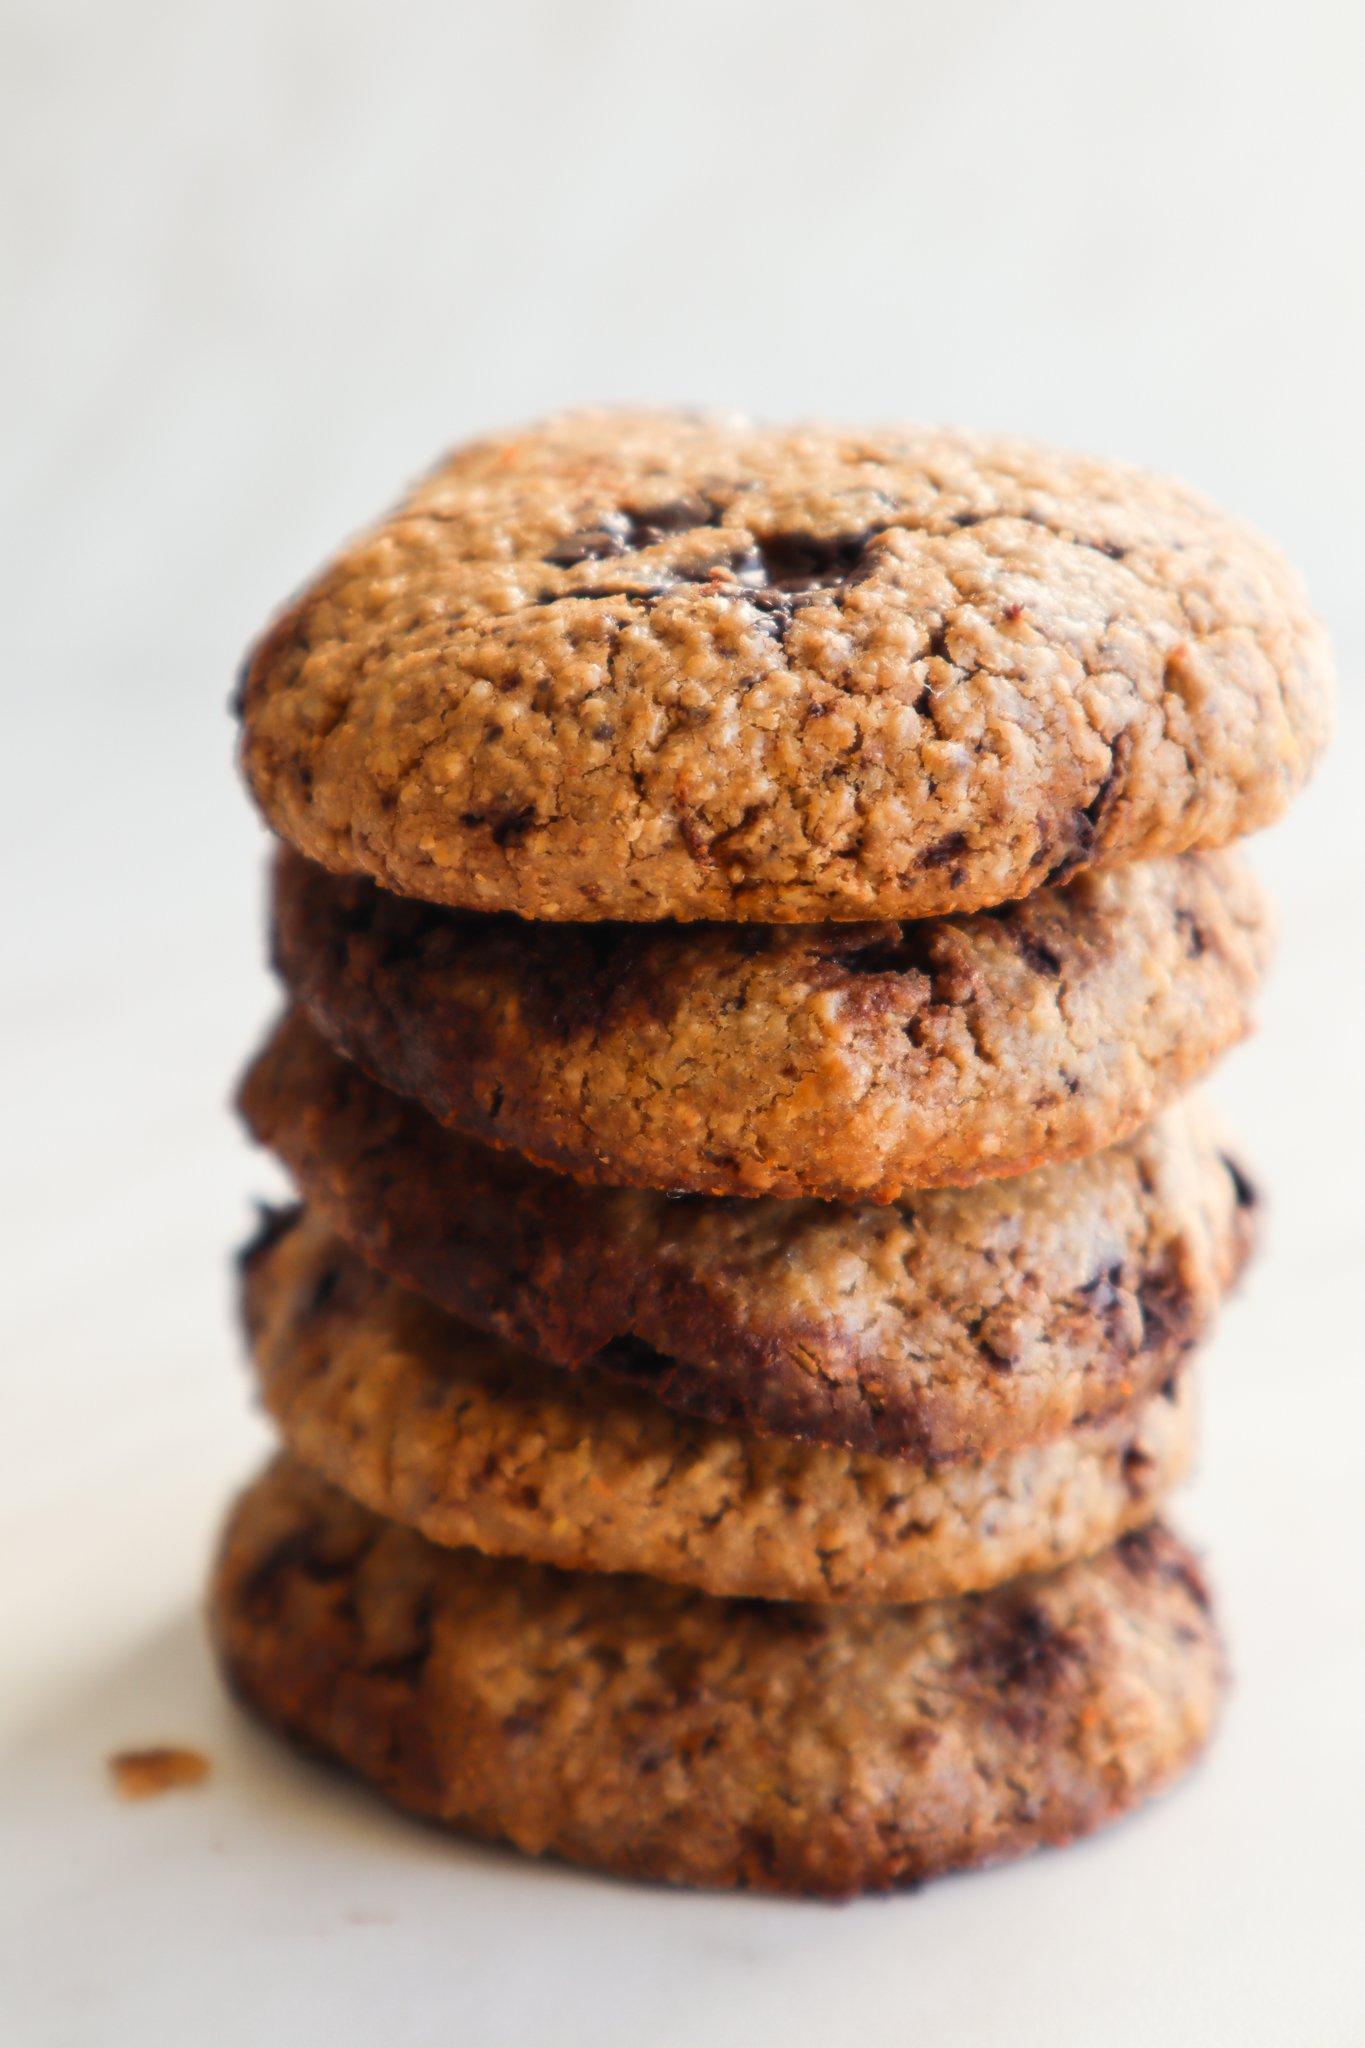 healthy snacks: oatmeal cookie recipe